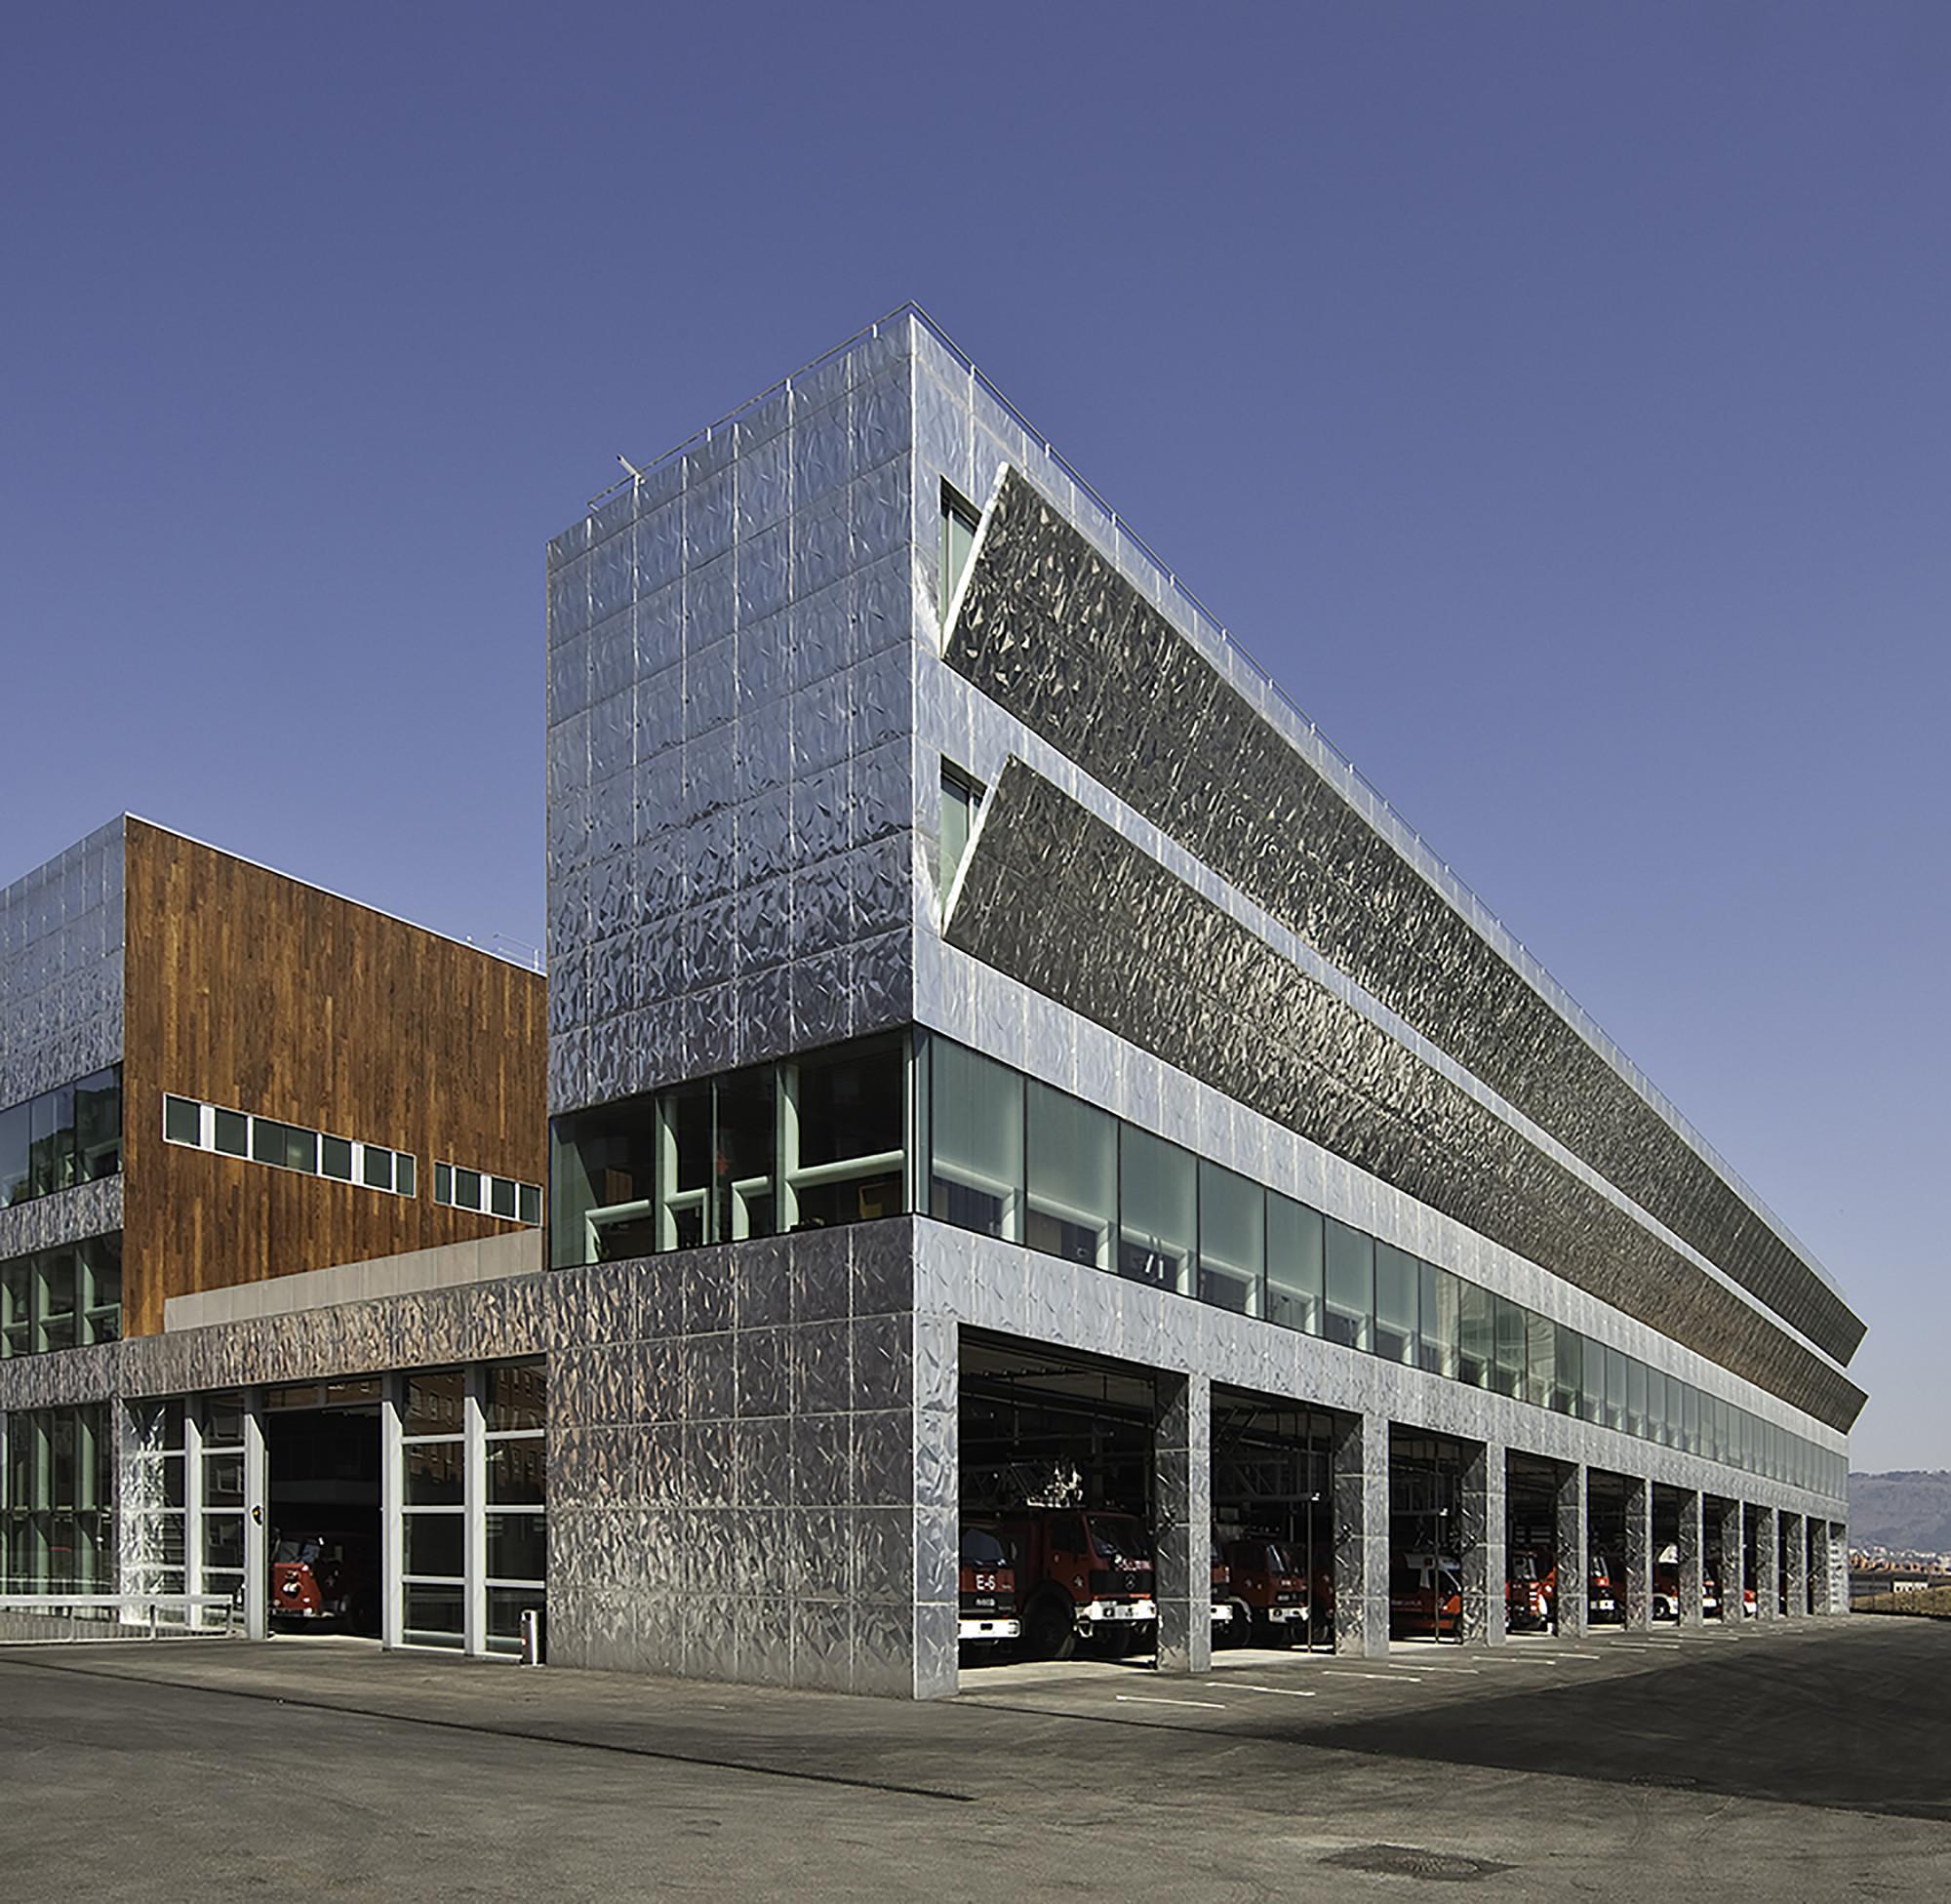 Firemen House  / Coll-Barreu Arquitectos, Courtesy of Coll-Barreu Arquitectos